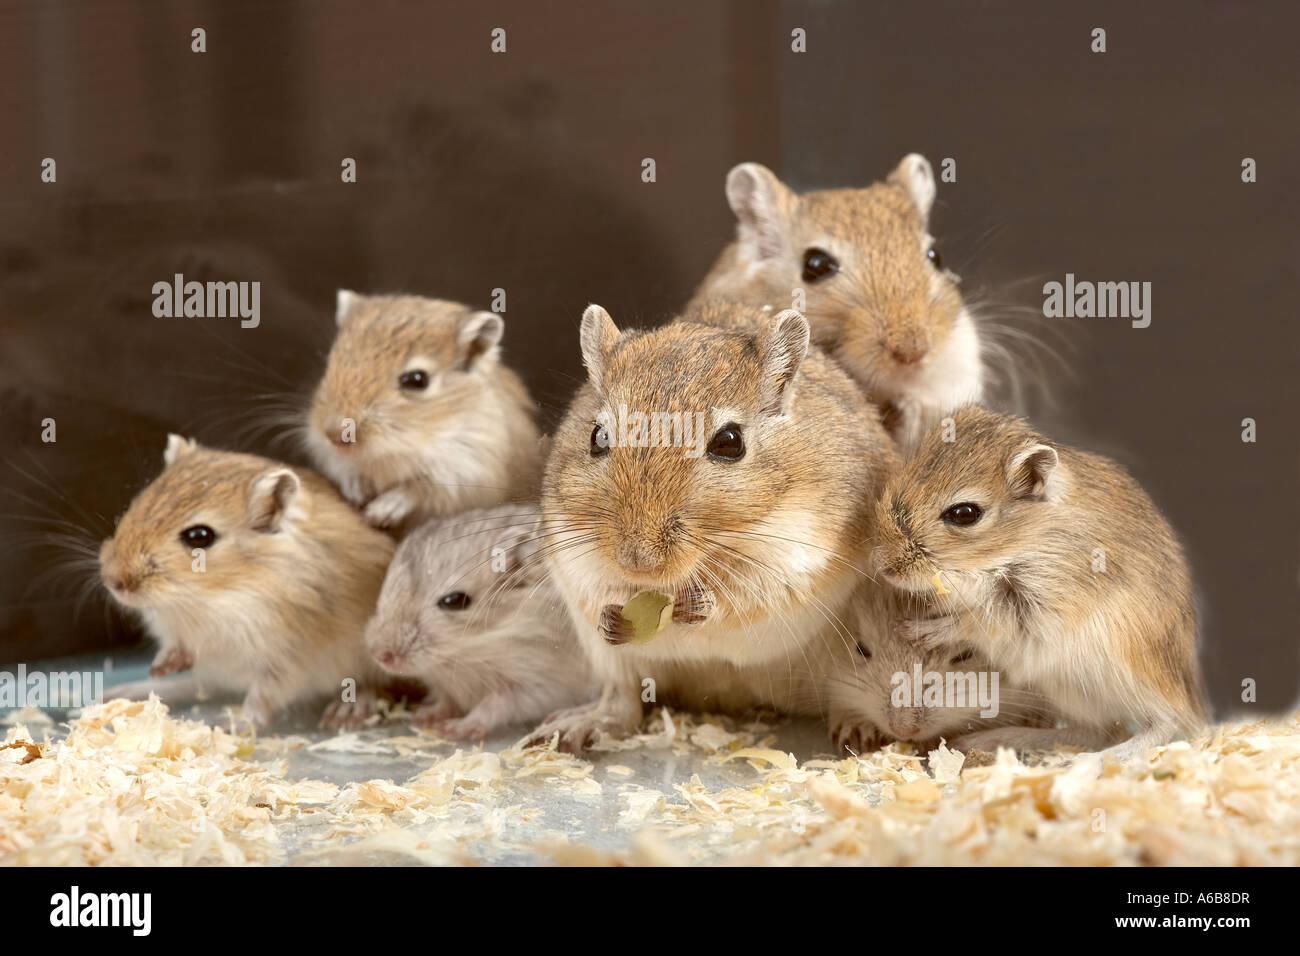 Feeding Baby Mice Food